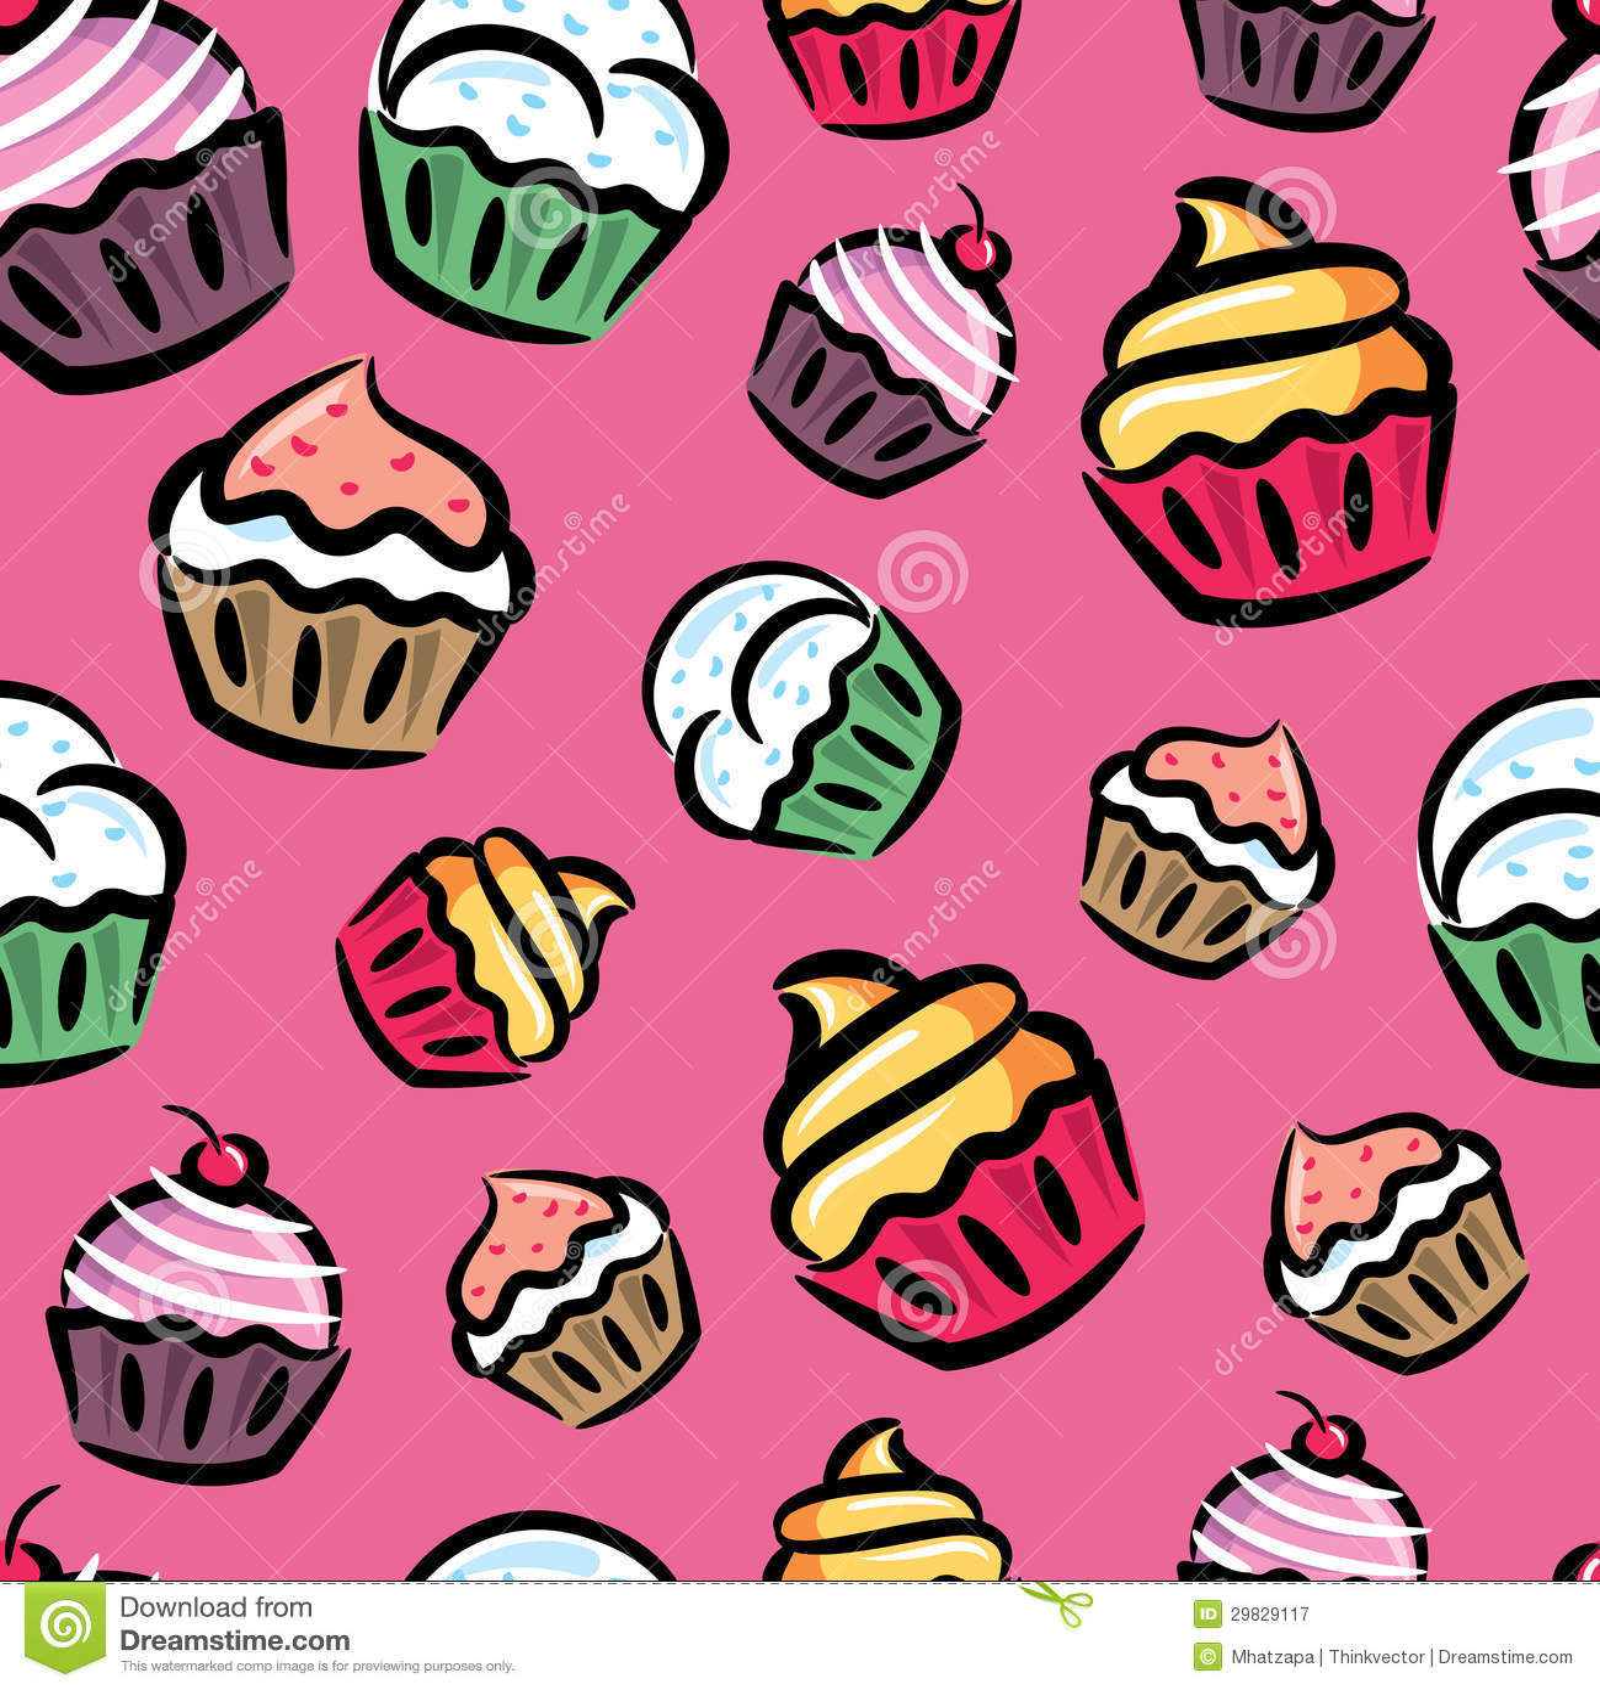 cupcake wallpaper hd vintage